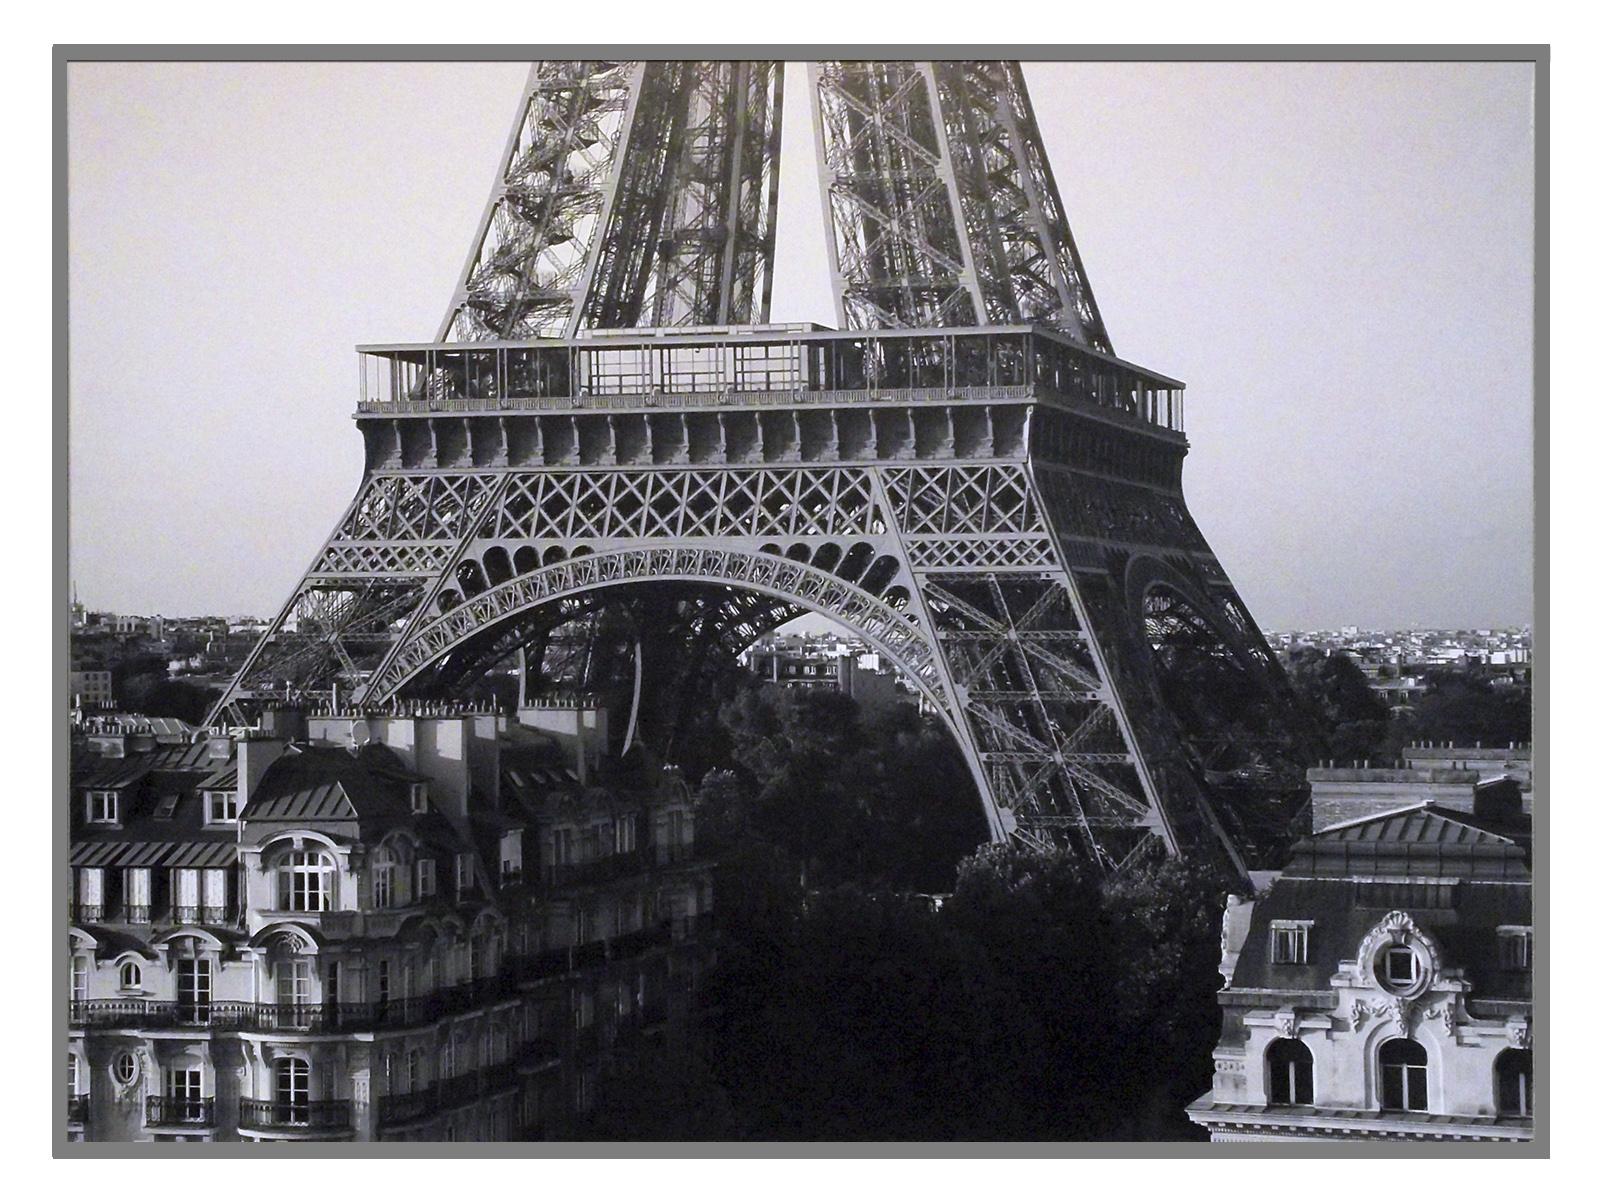 Постер Eiffel 3FR190 ОГОГО Обстановочка!